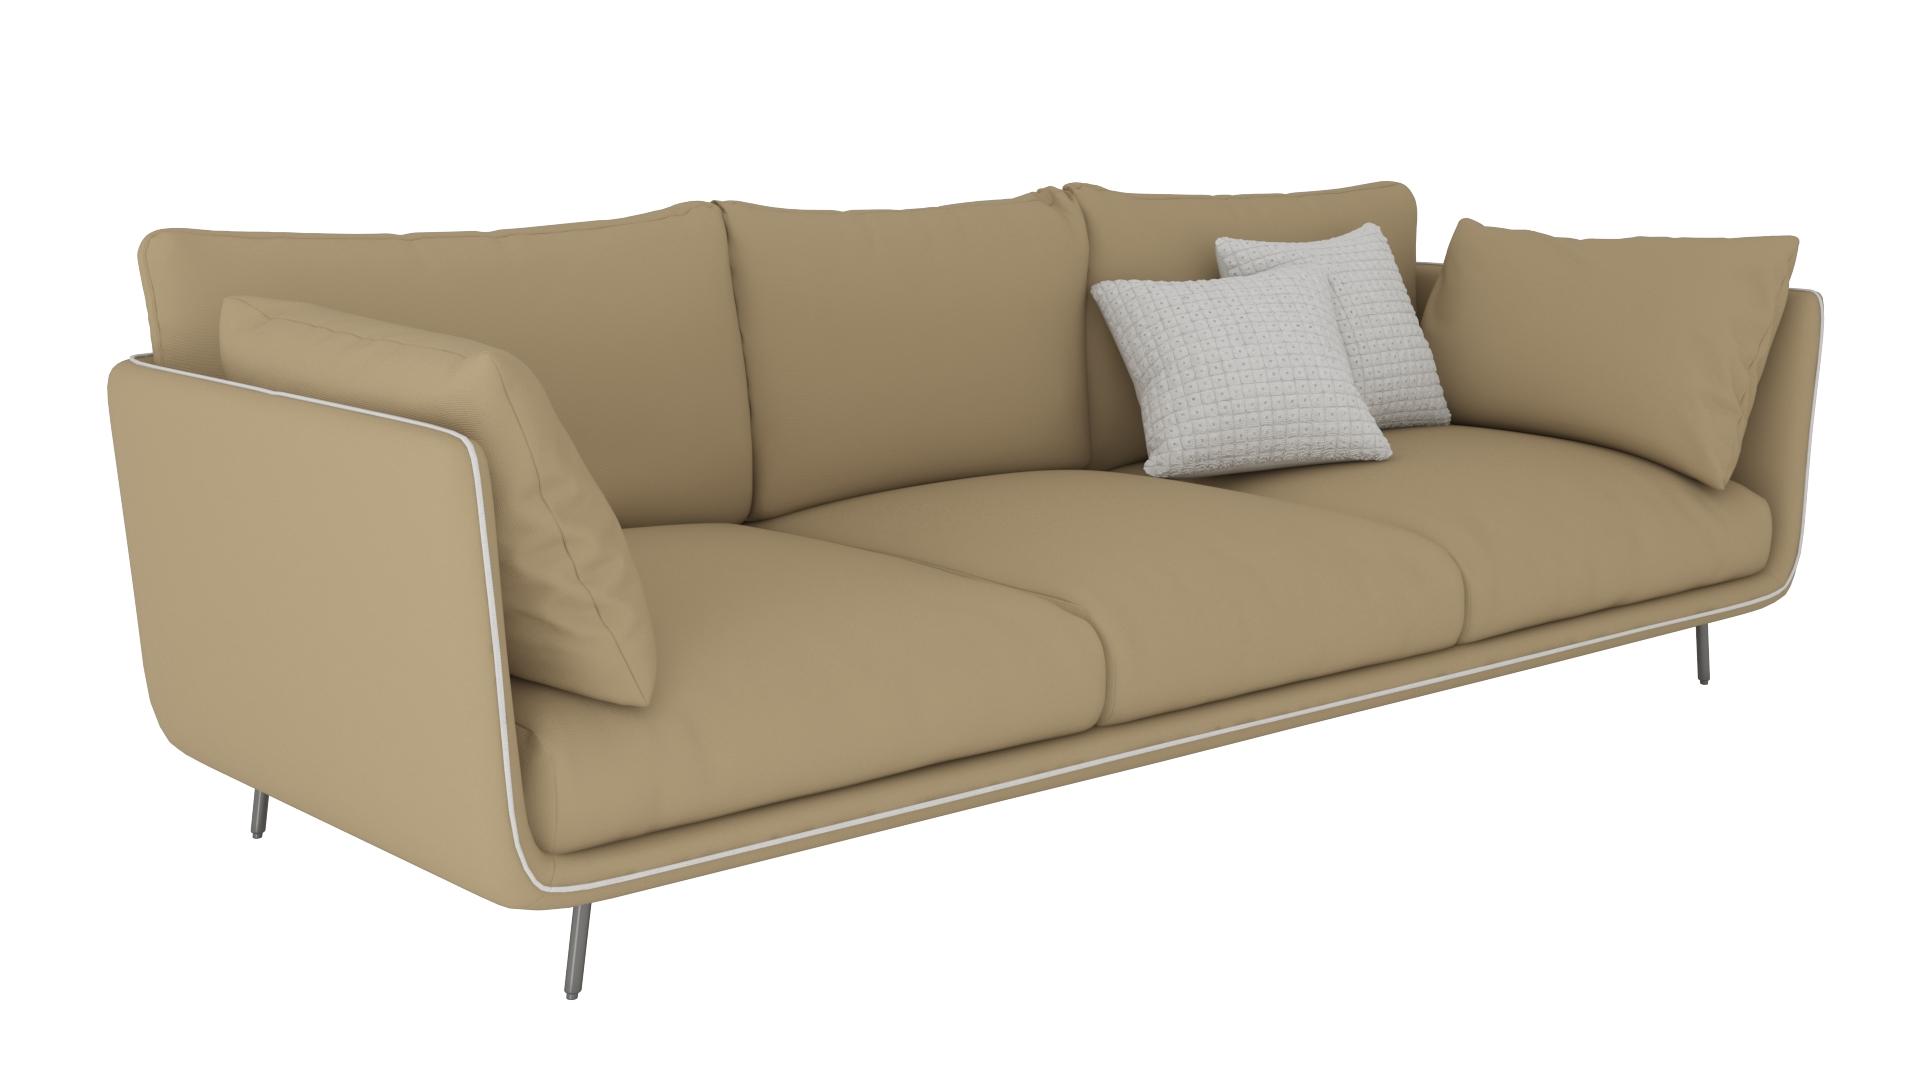 sofa_1_8_Copy-0.jpg